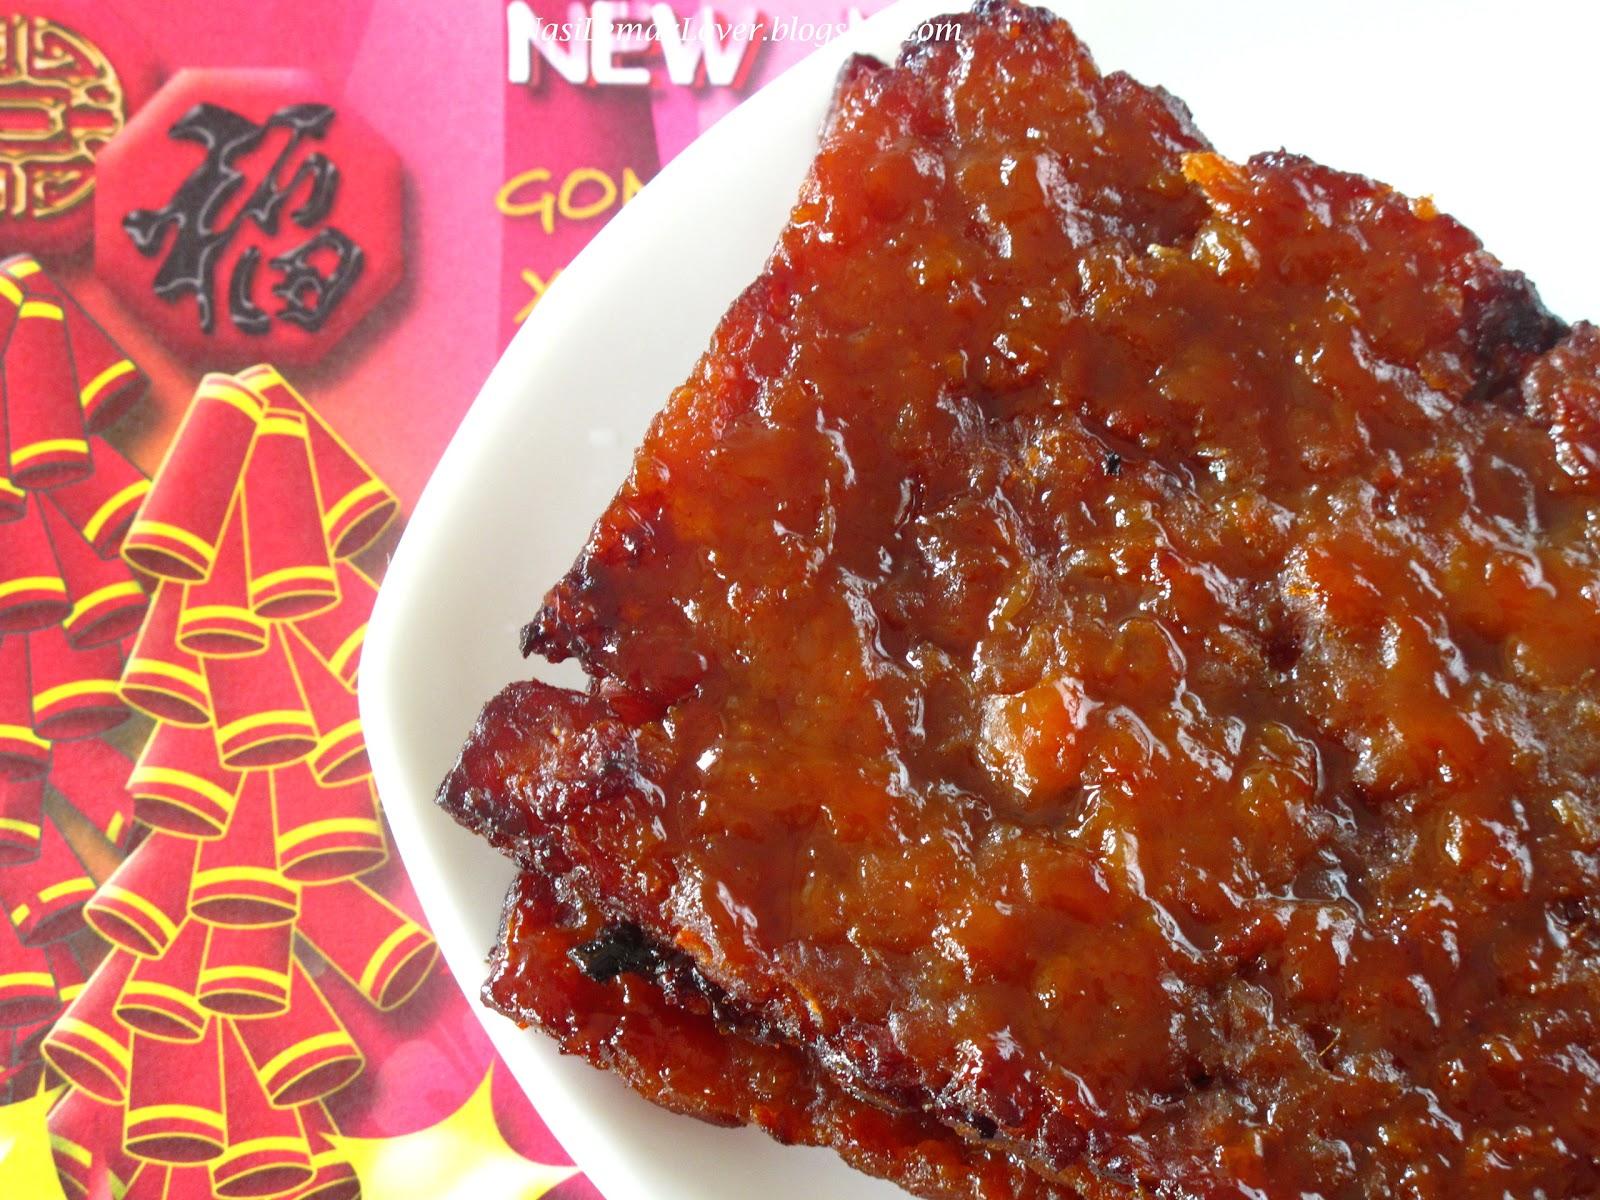 chinese beef jerky - photo #22